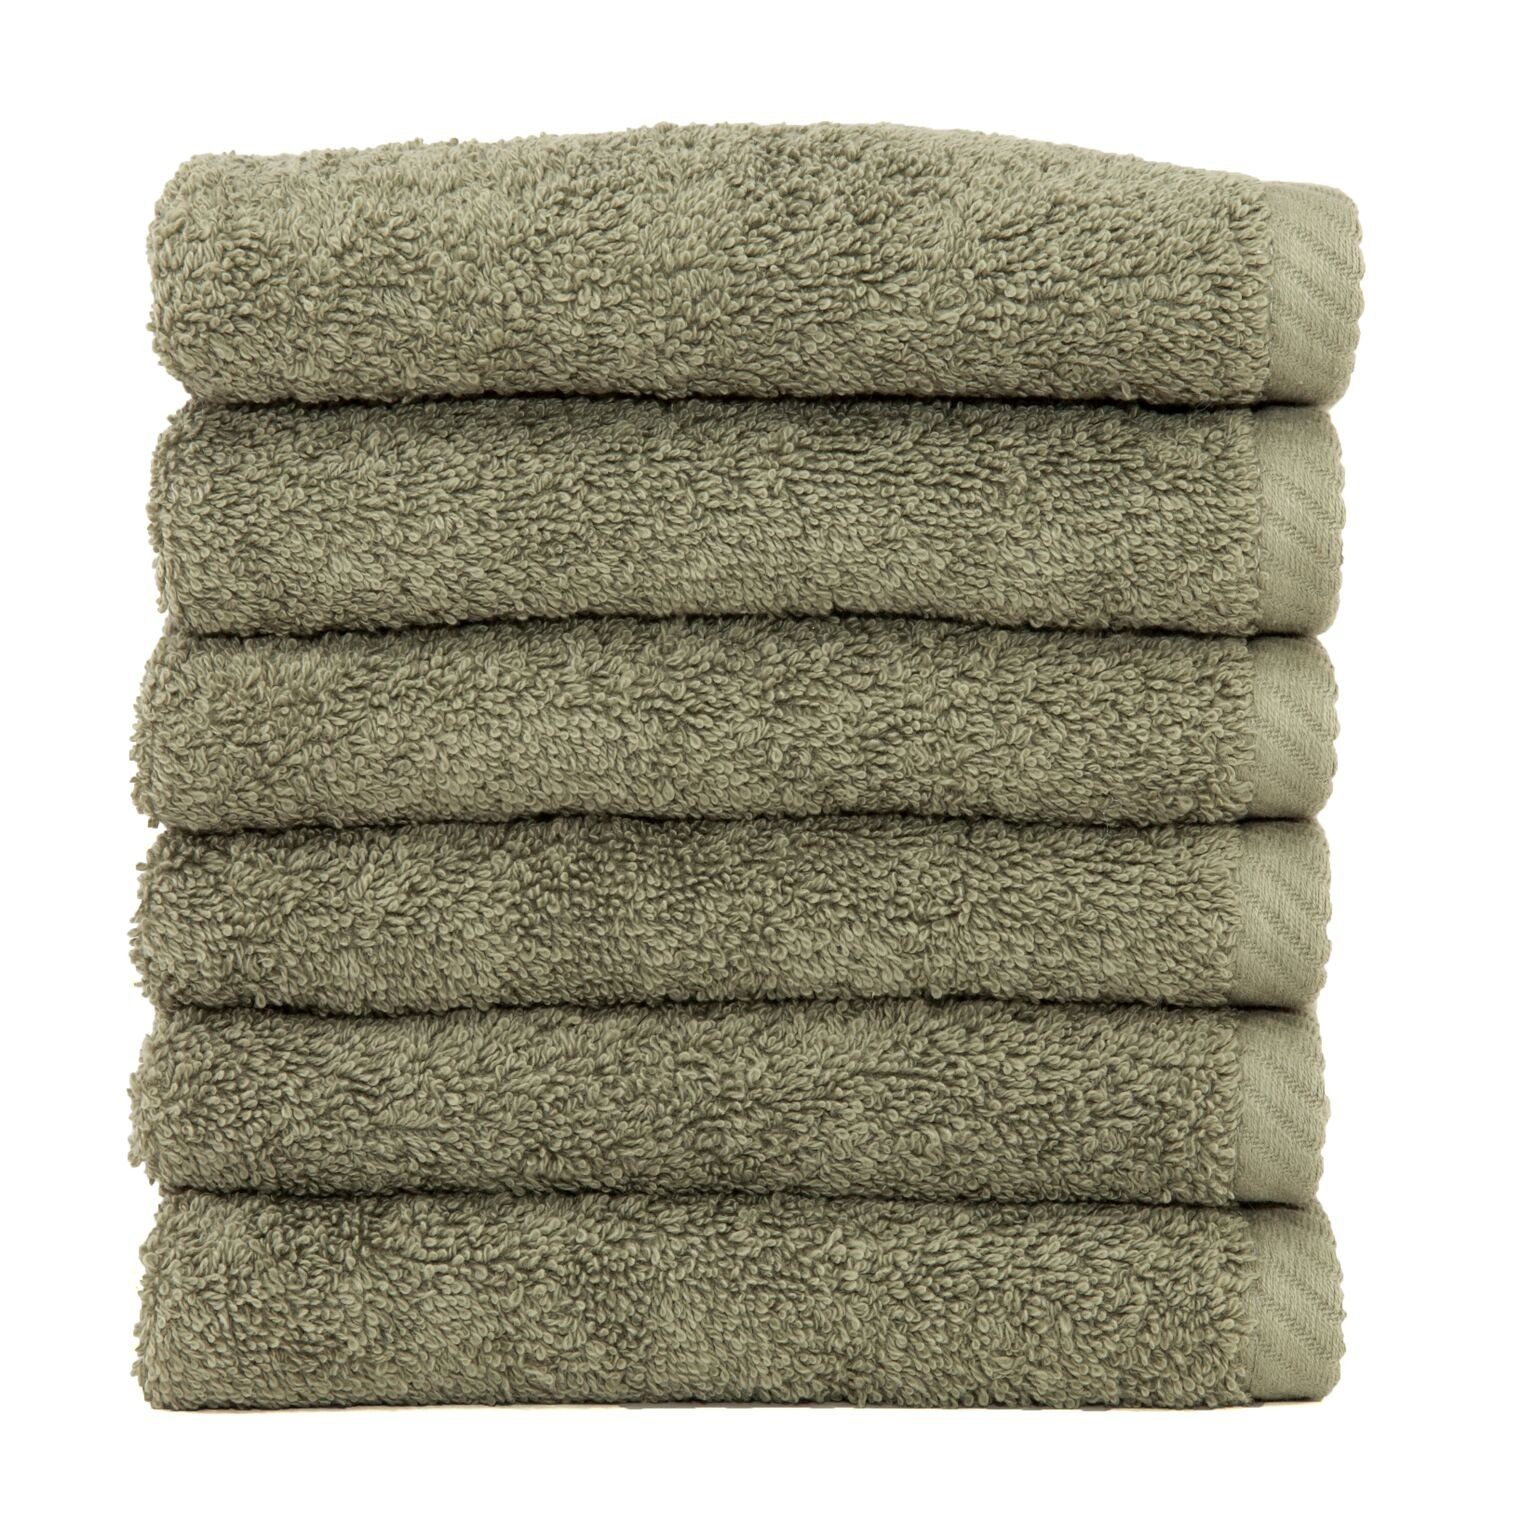 Linum Home Textiles Soft Twist Premium Authentic Soft 100% Turkish Cotton Luxury Hotel Collection Washcloth, Set of 6, Light Olive